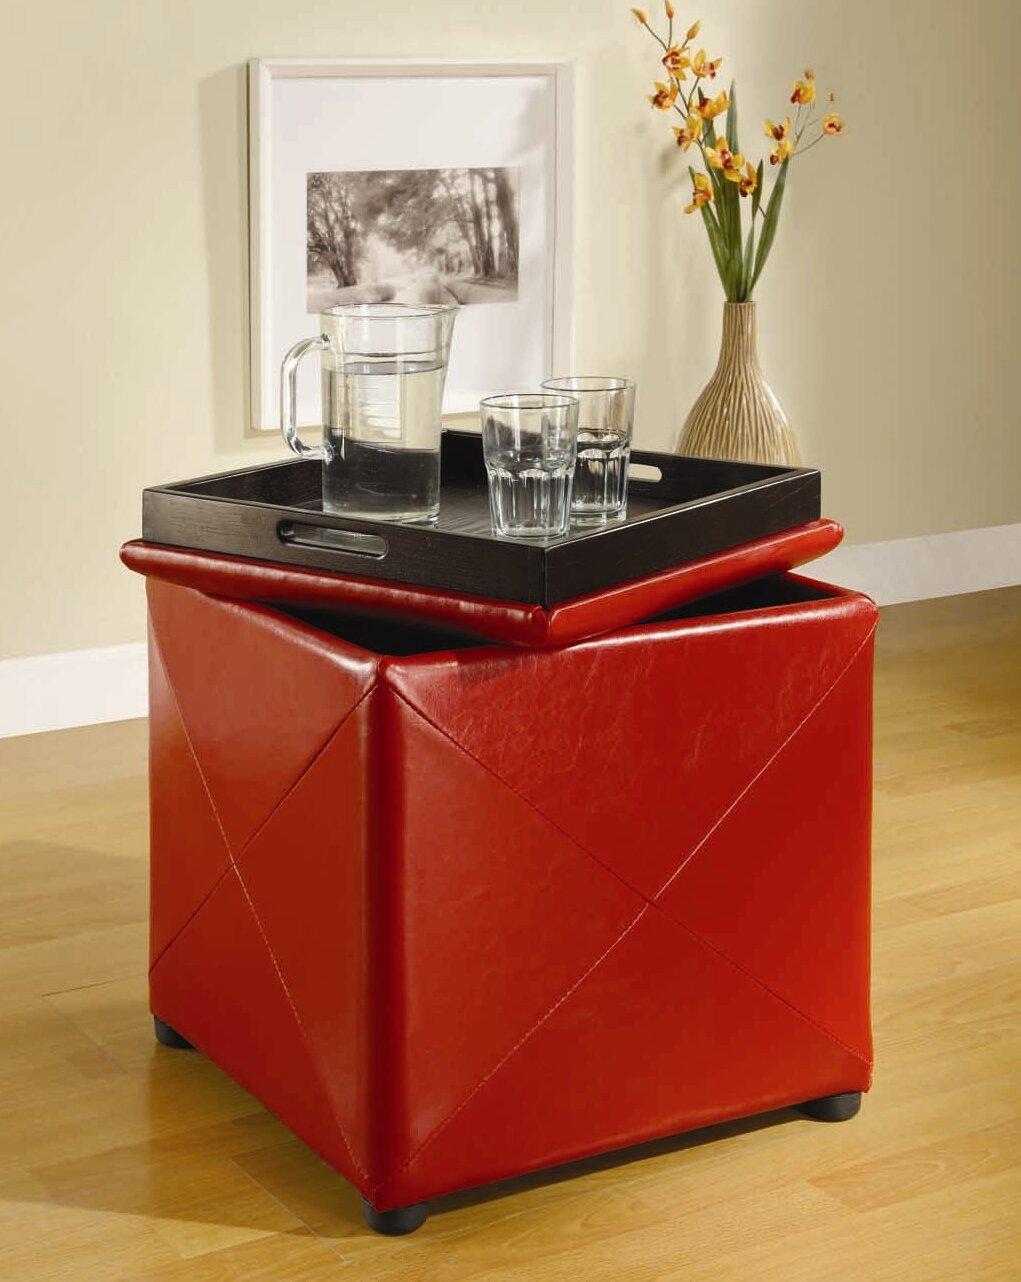 Exceptional Red Barrel Studio West Seattle Storage Ottoman U0026 Reviews | Wayfair